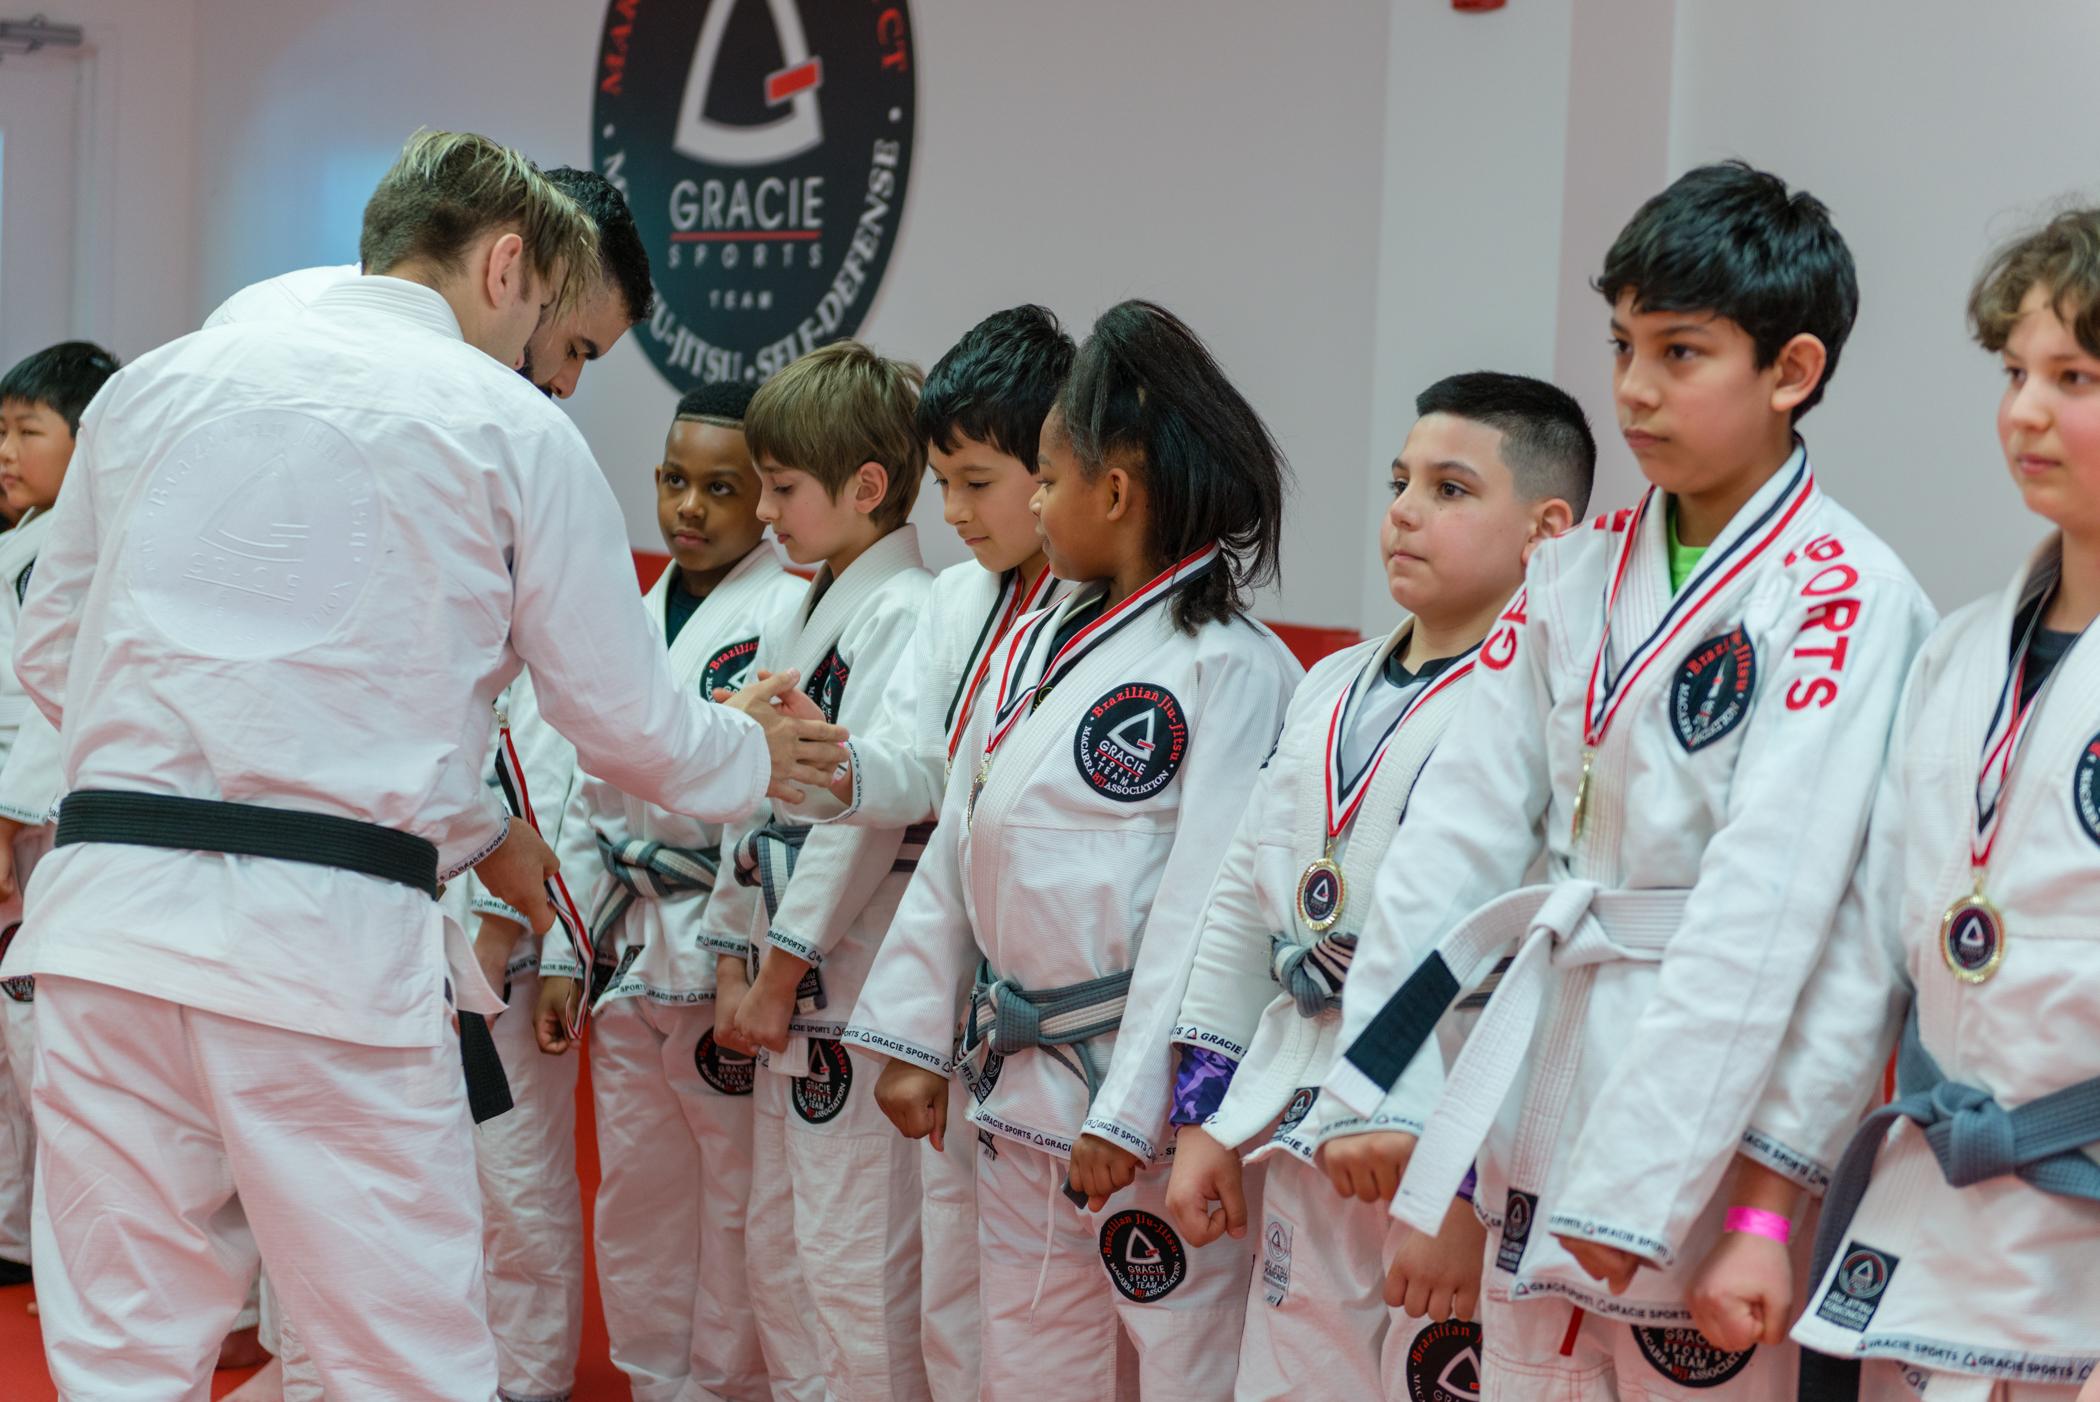 Gracie-Sports-Kids-101.jpg